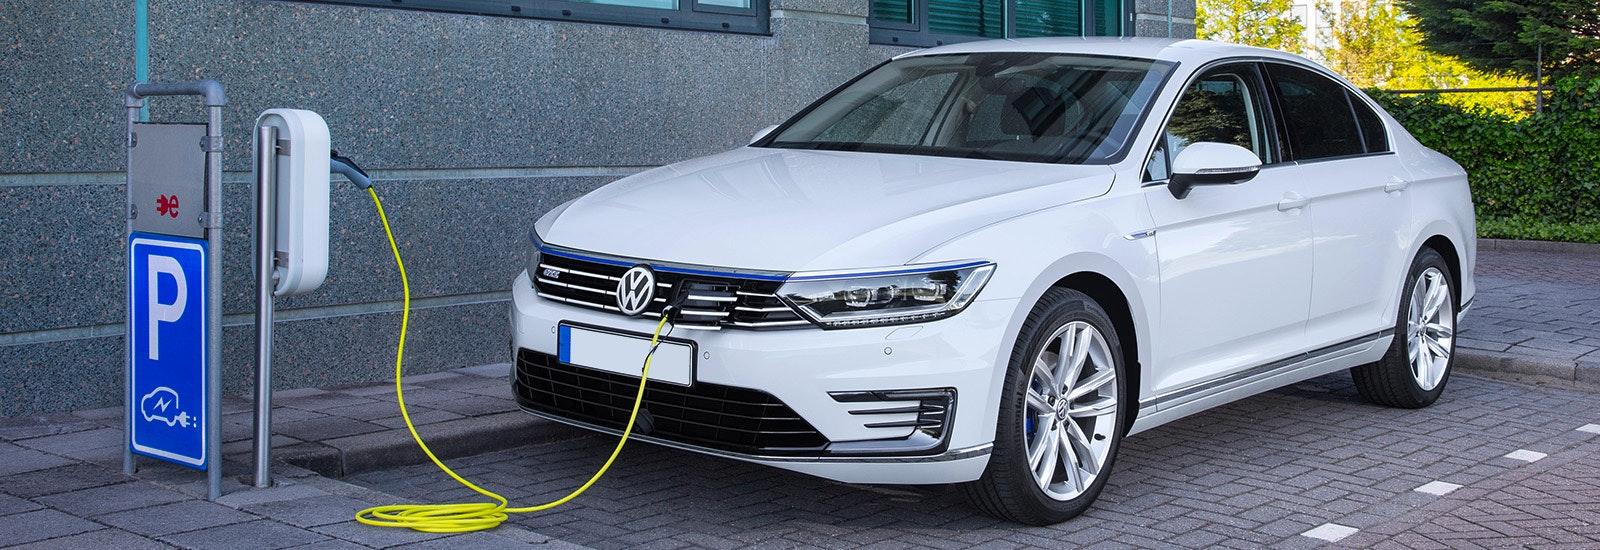 Volkswagen Passat Gte Review Carwow